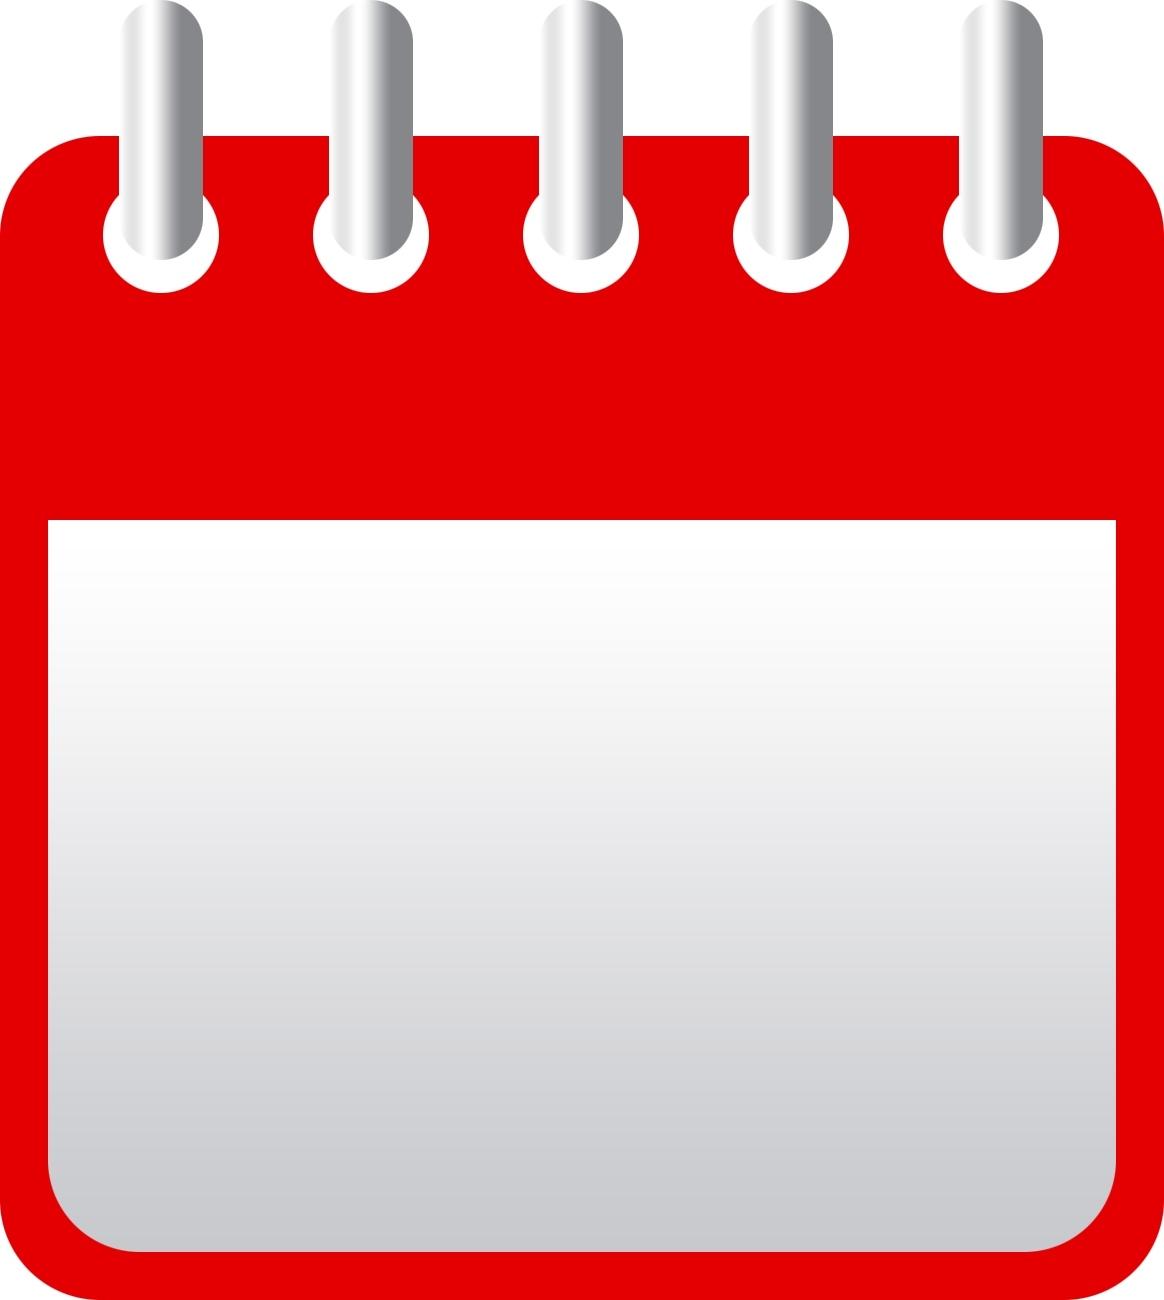 Icon Calendar #164238 - Free Icons Library Calendar Icon 16X16 Free